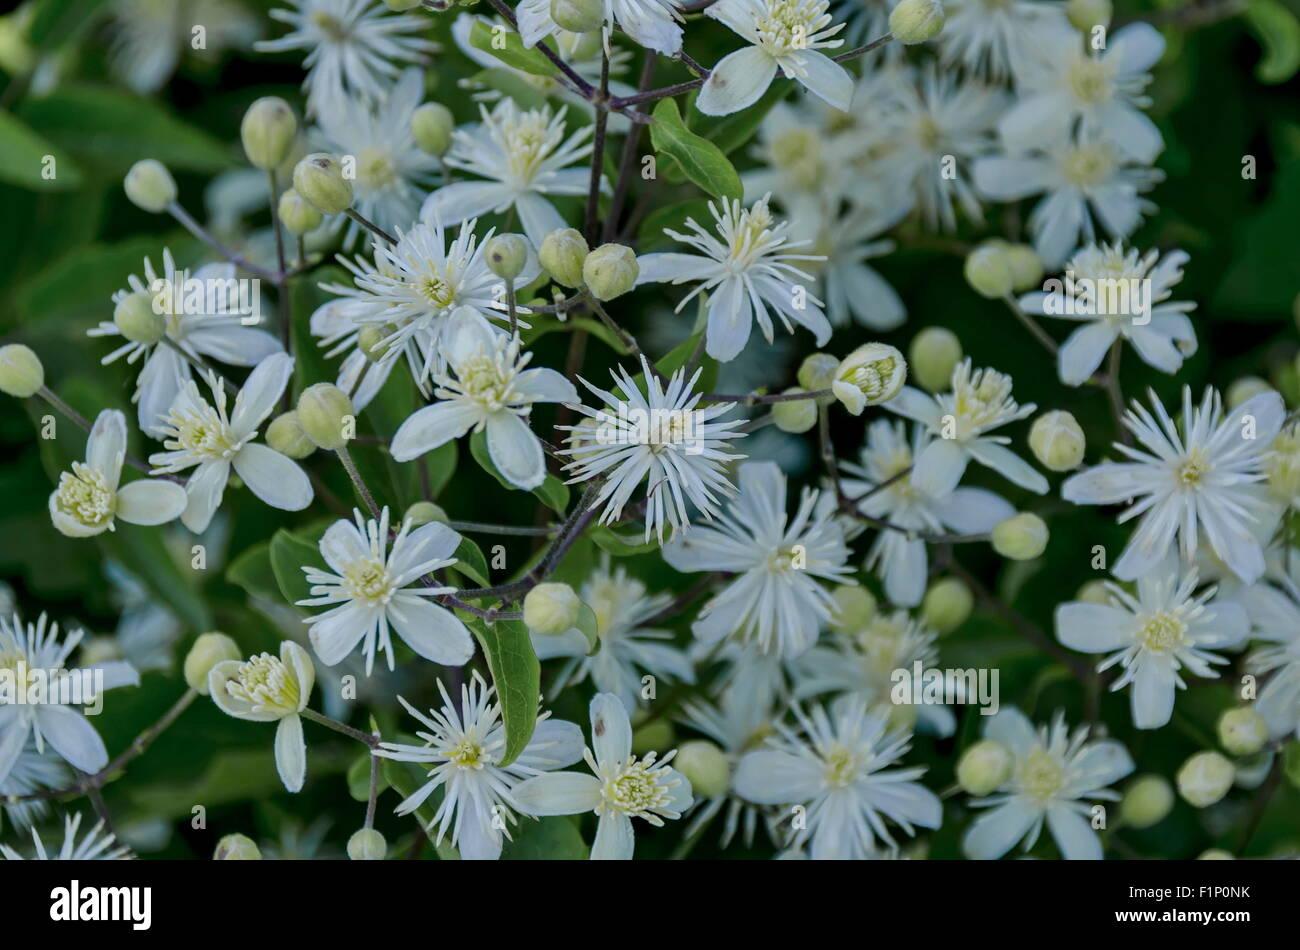 Plain clematis (Clematis vitalba), Old Man's Beard or Traveler's Joy, bushy plant blossom - Stock Image